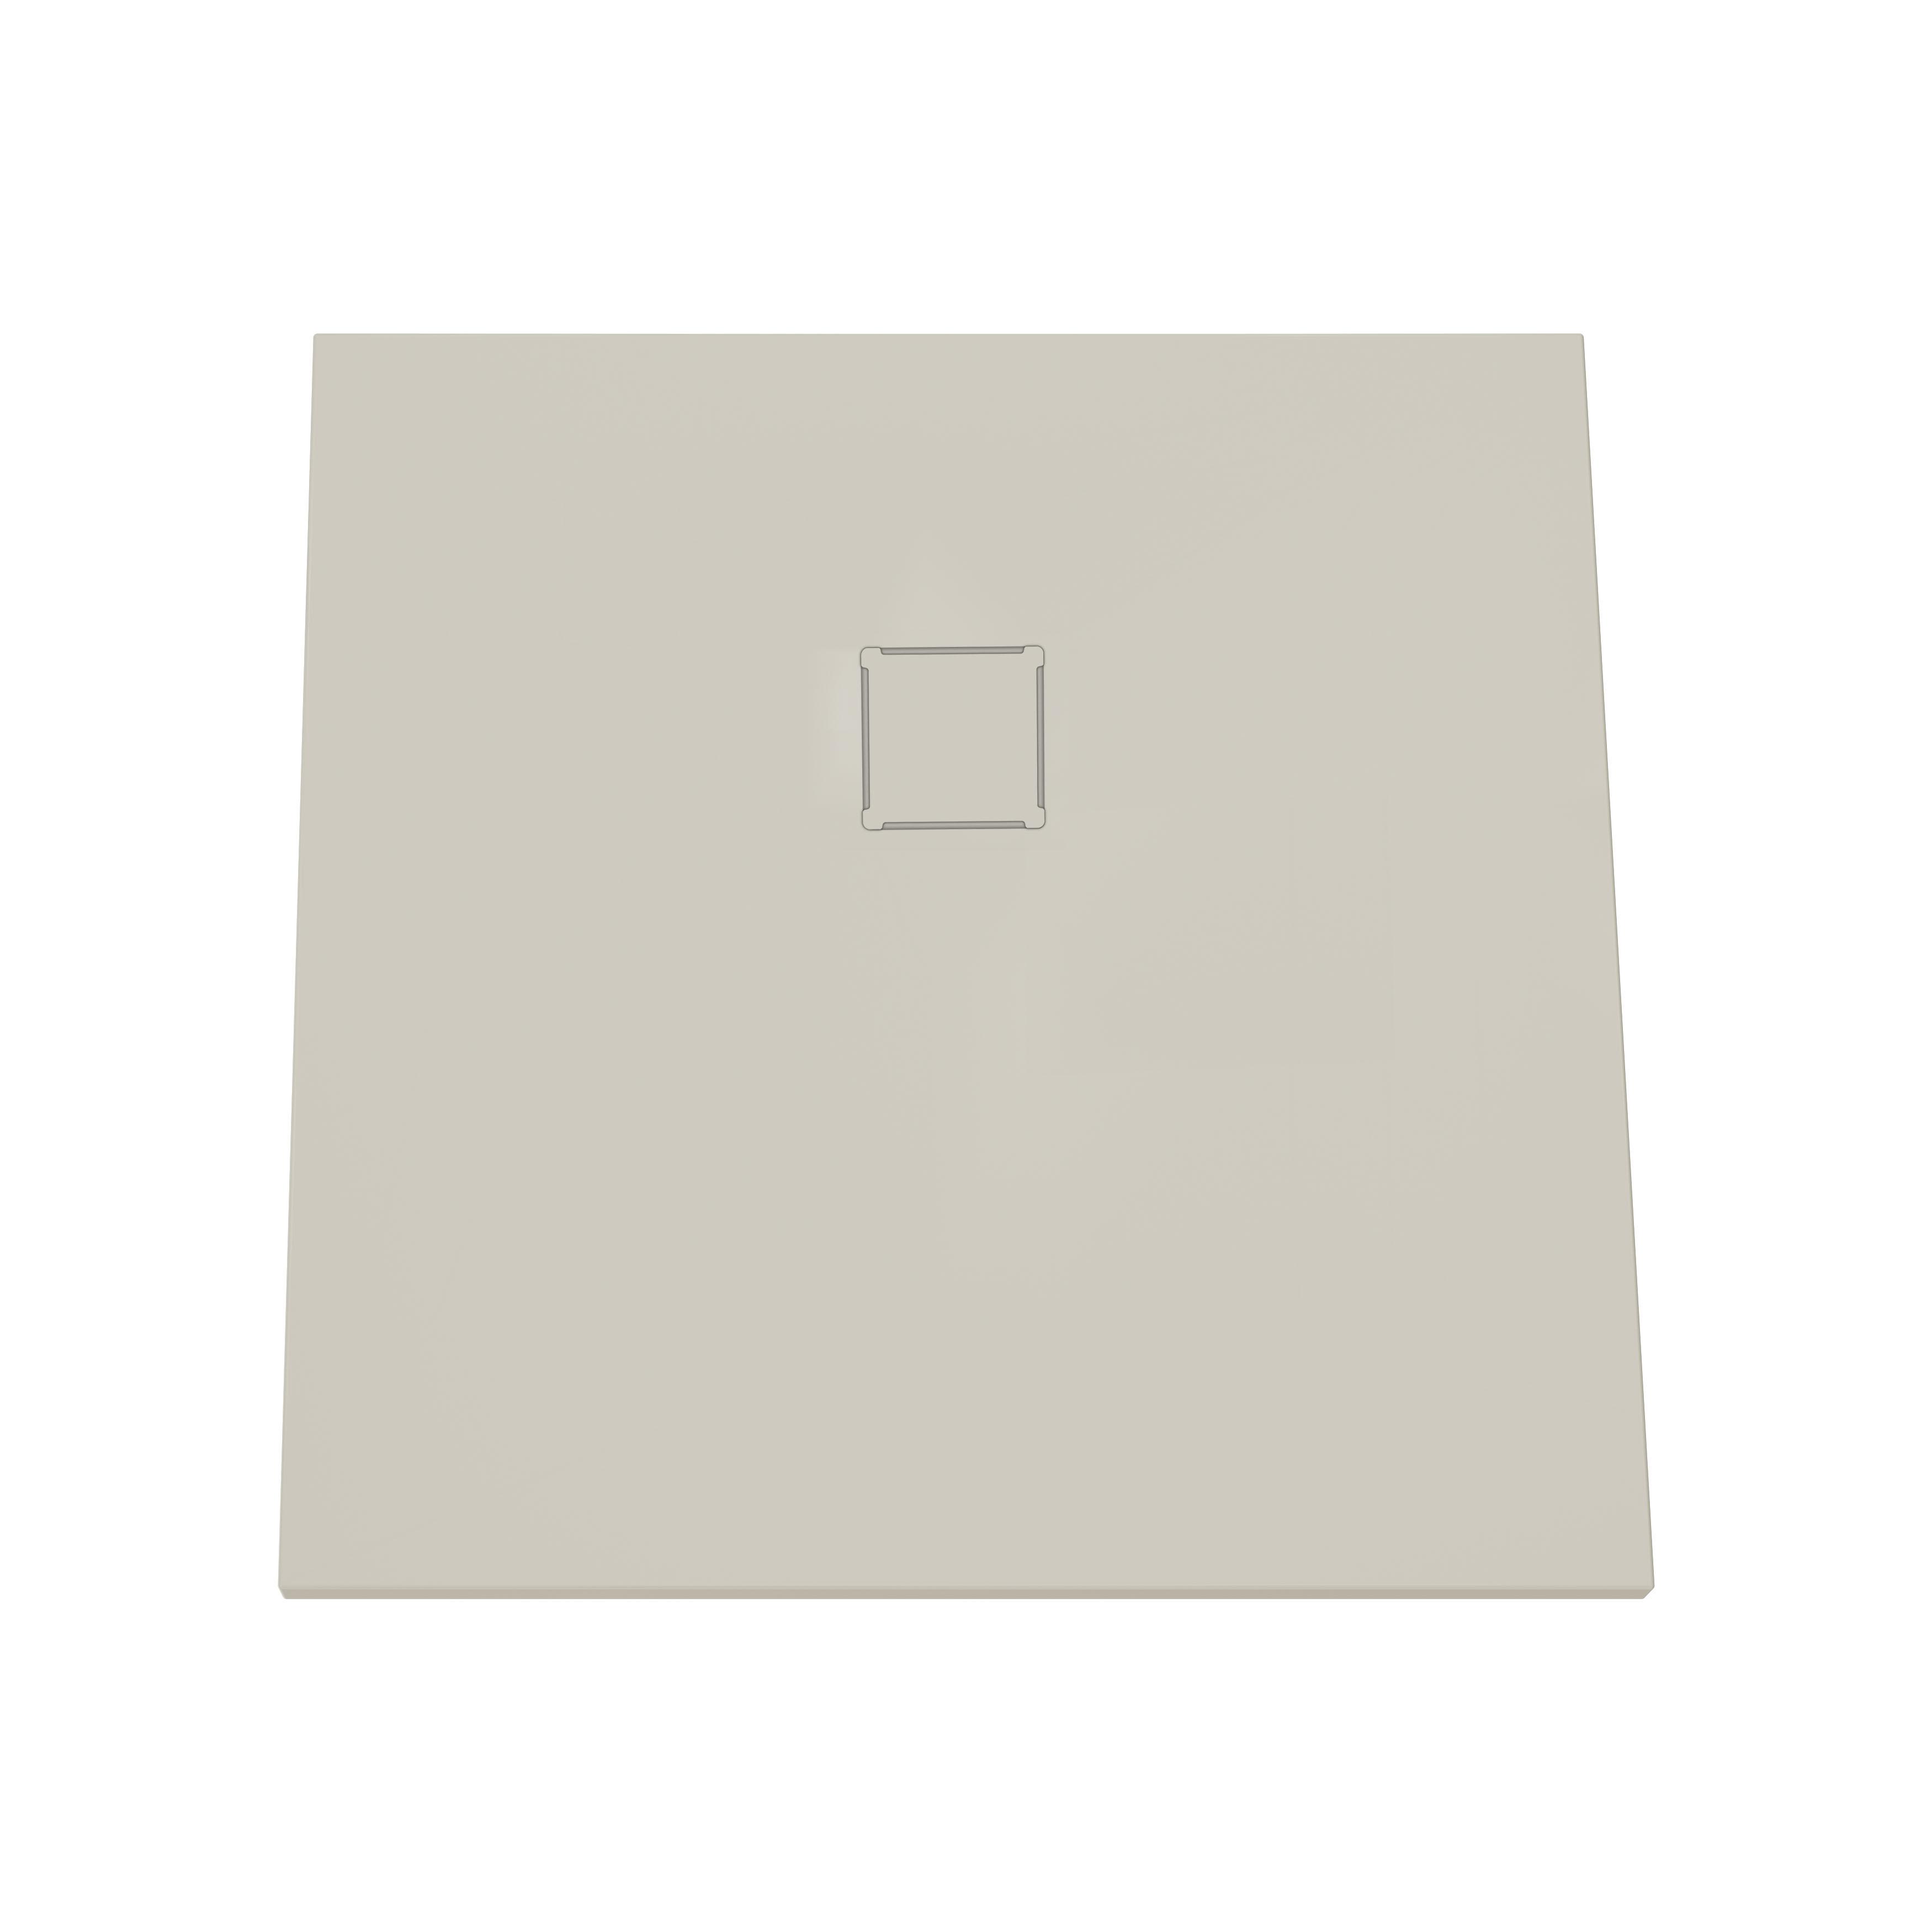 V-stone, receveur ultra plat en solid stone, 100 cm, taupe